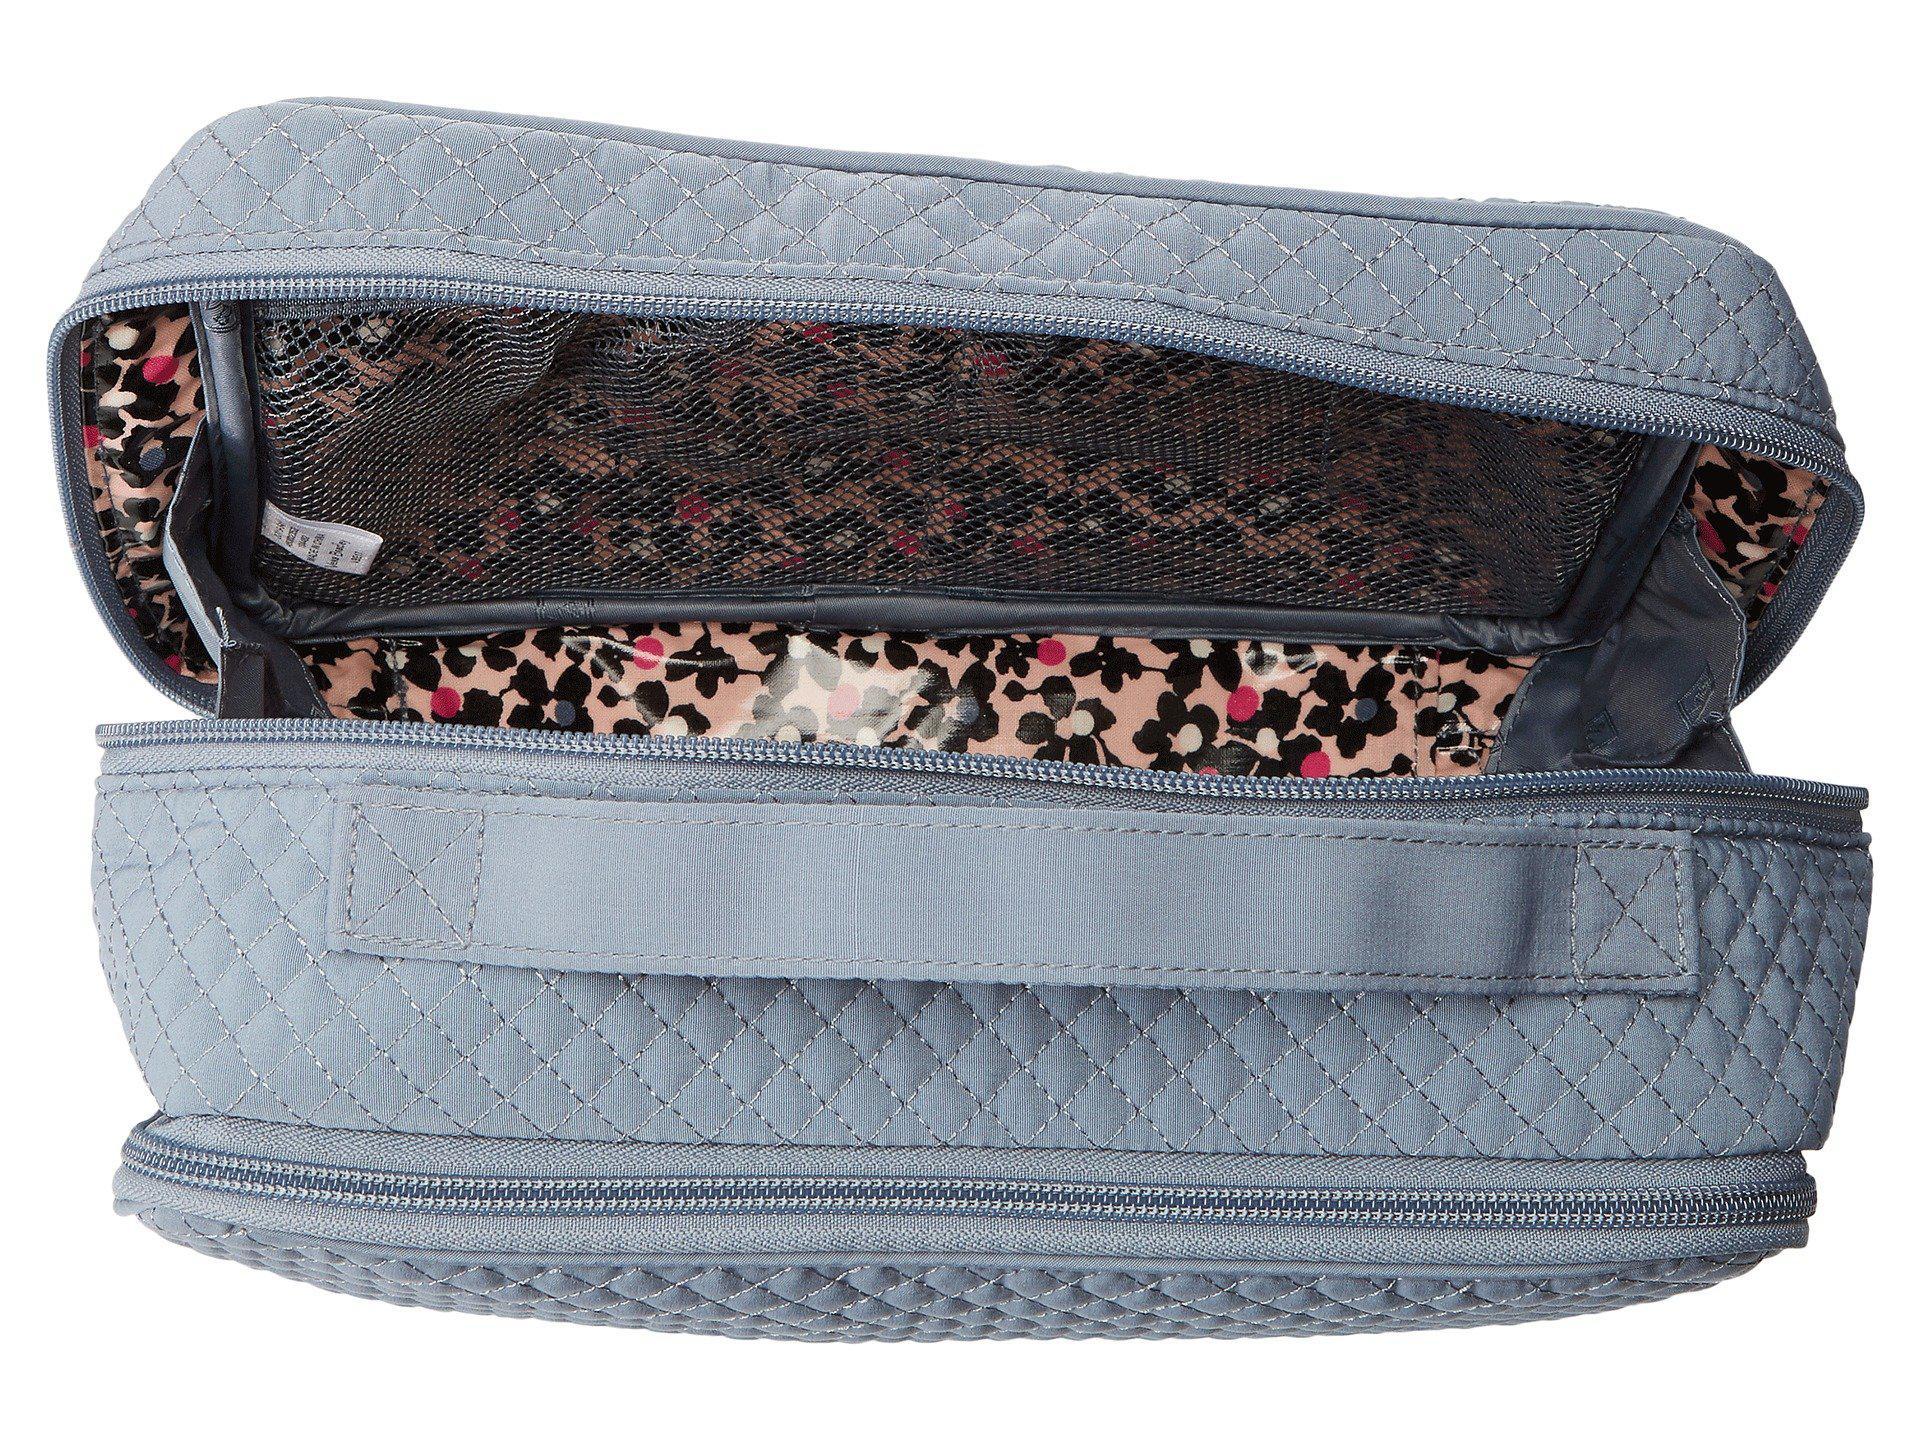 3f59b0c73b57 Vera Bradley - Gray Iconic Large Blush Brush Case (classic Navy) Luggage -  Lyst. View fullscreen